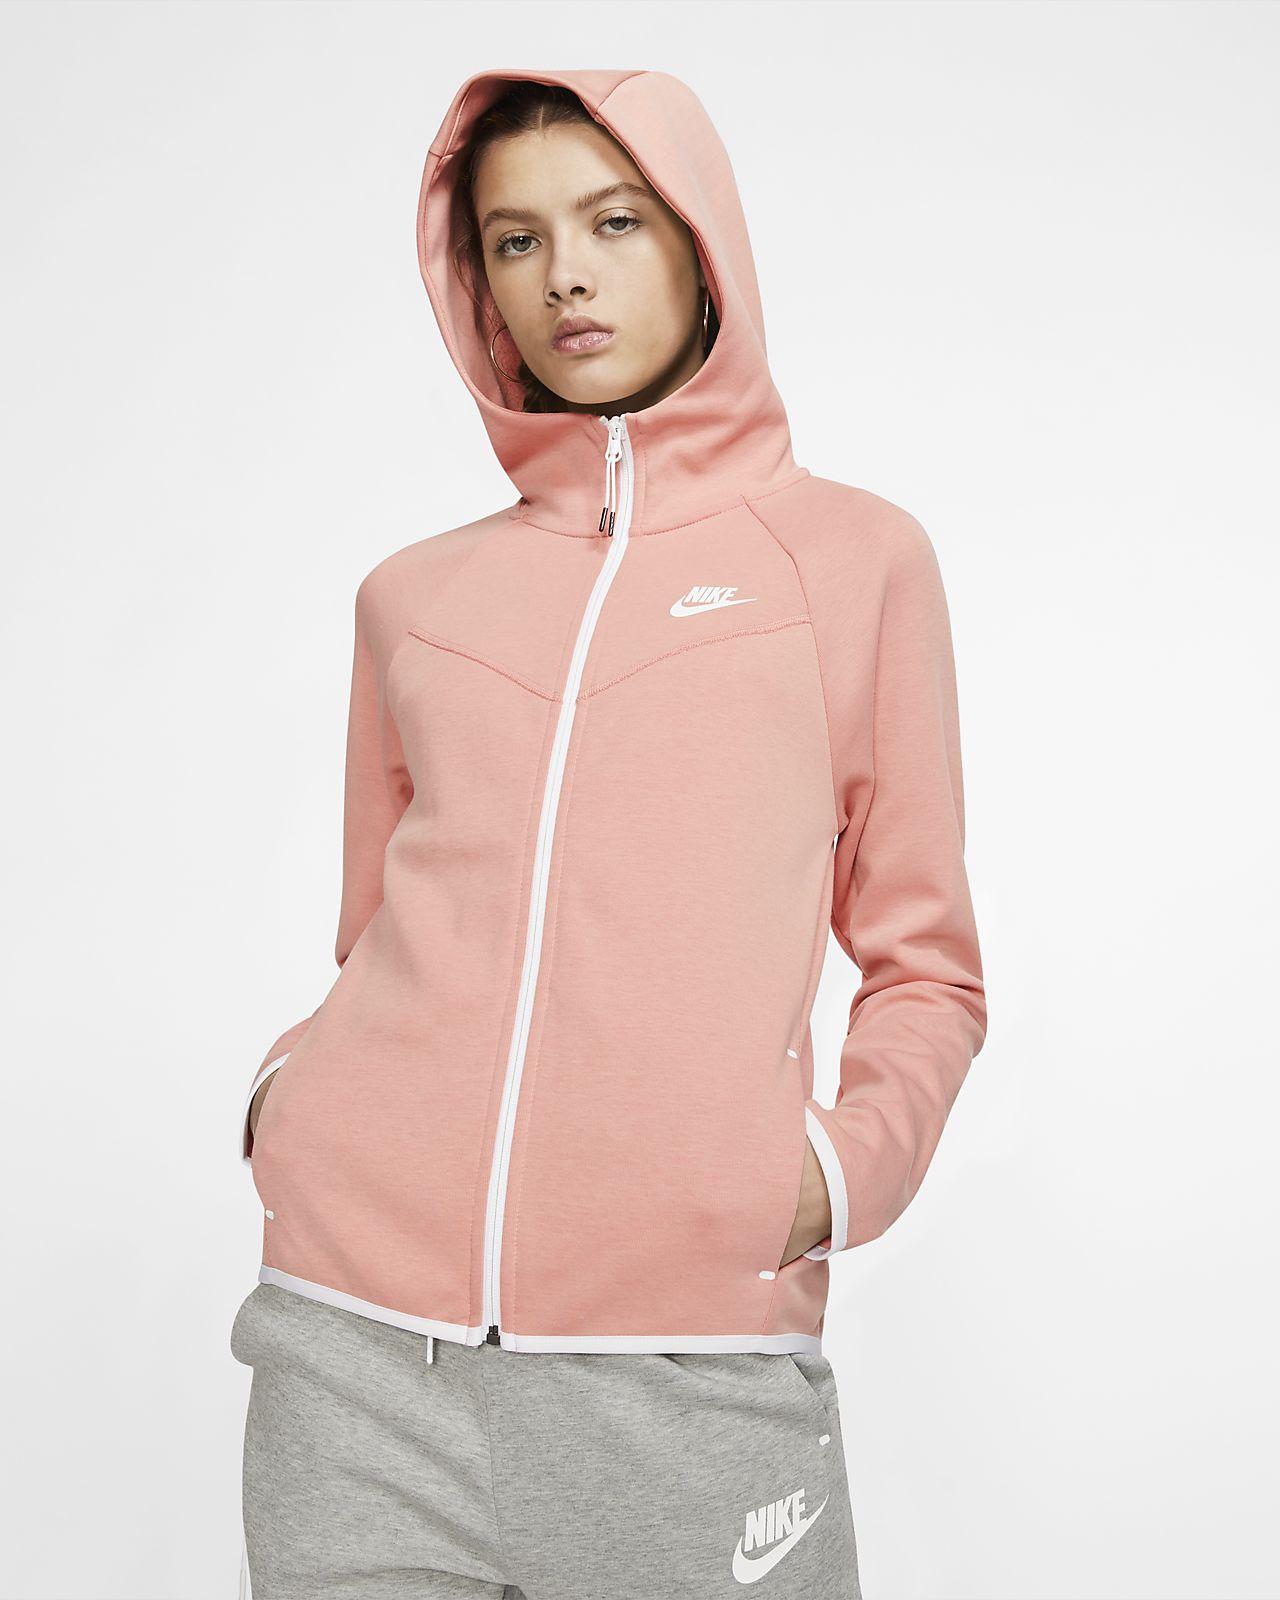 Nike Sportswear Windrunner Tech Fleece Sudadera con capucha y cremallera completa Mujer